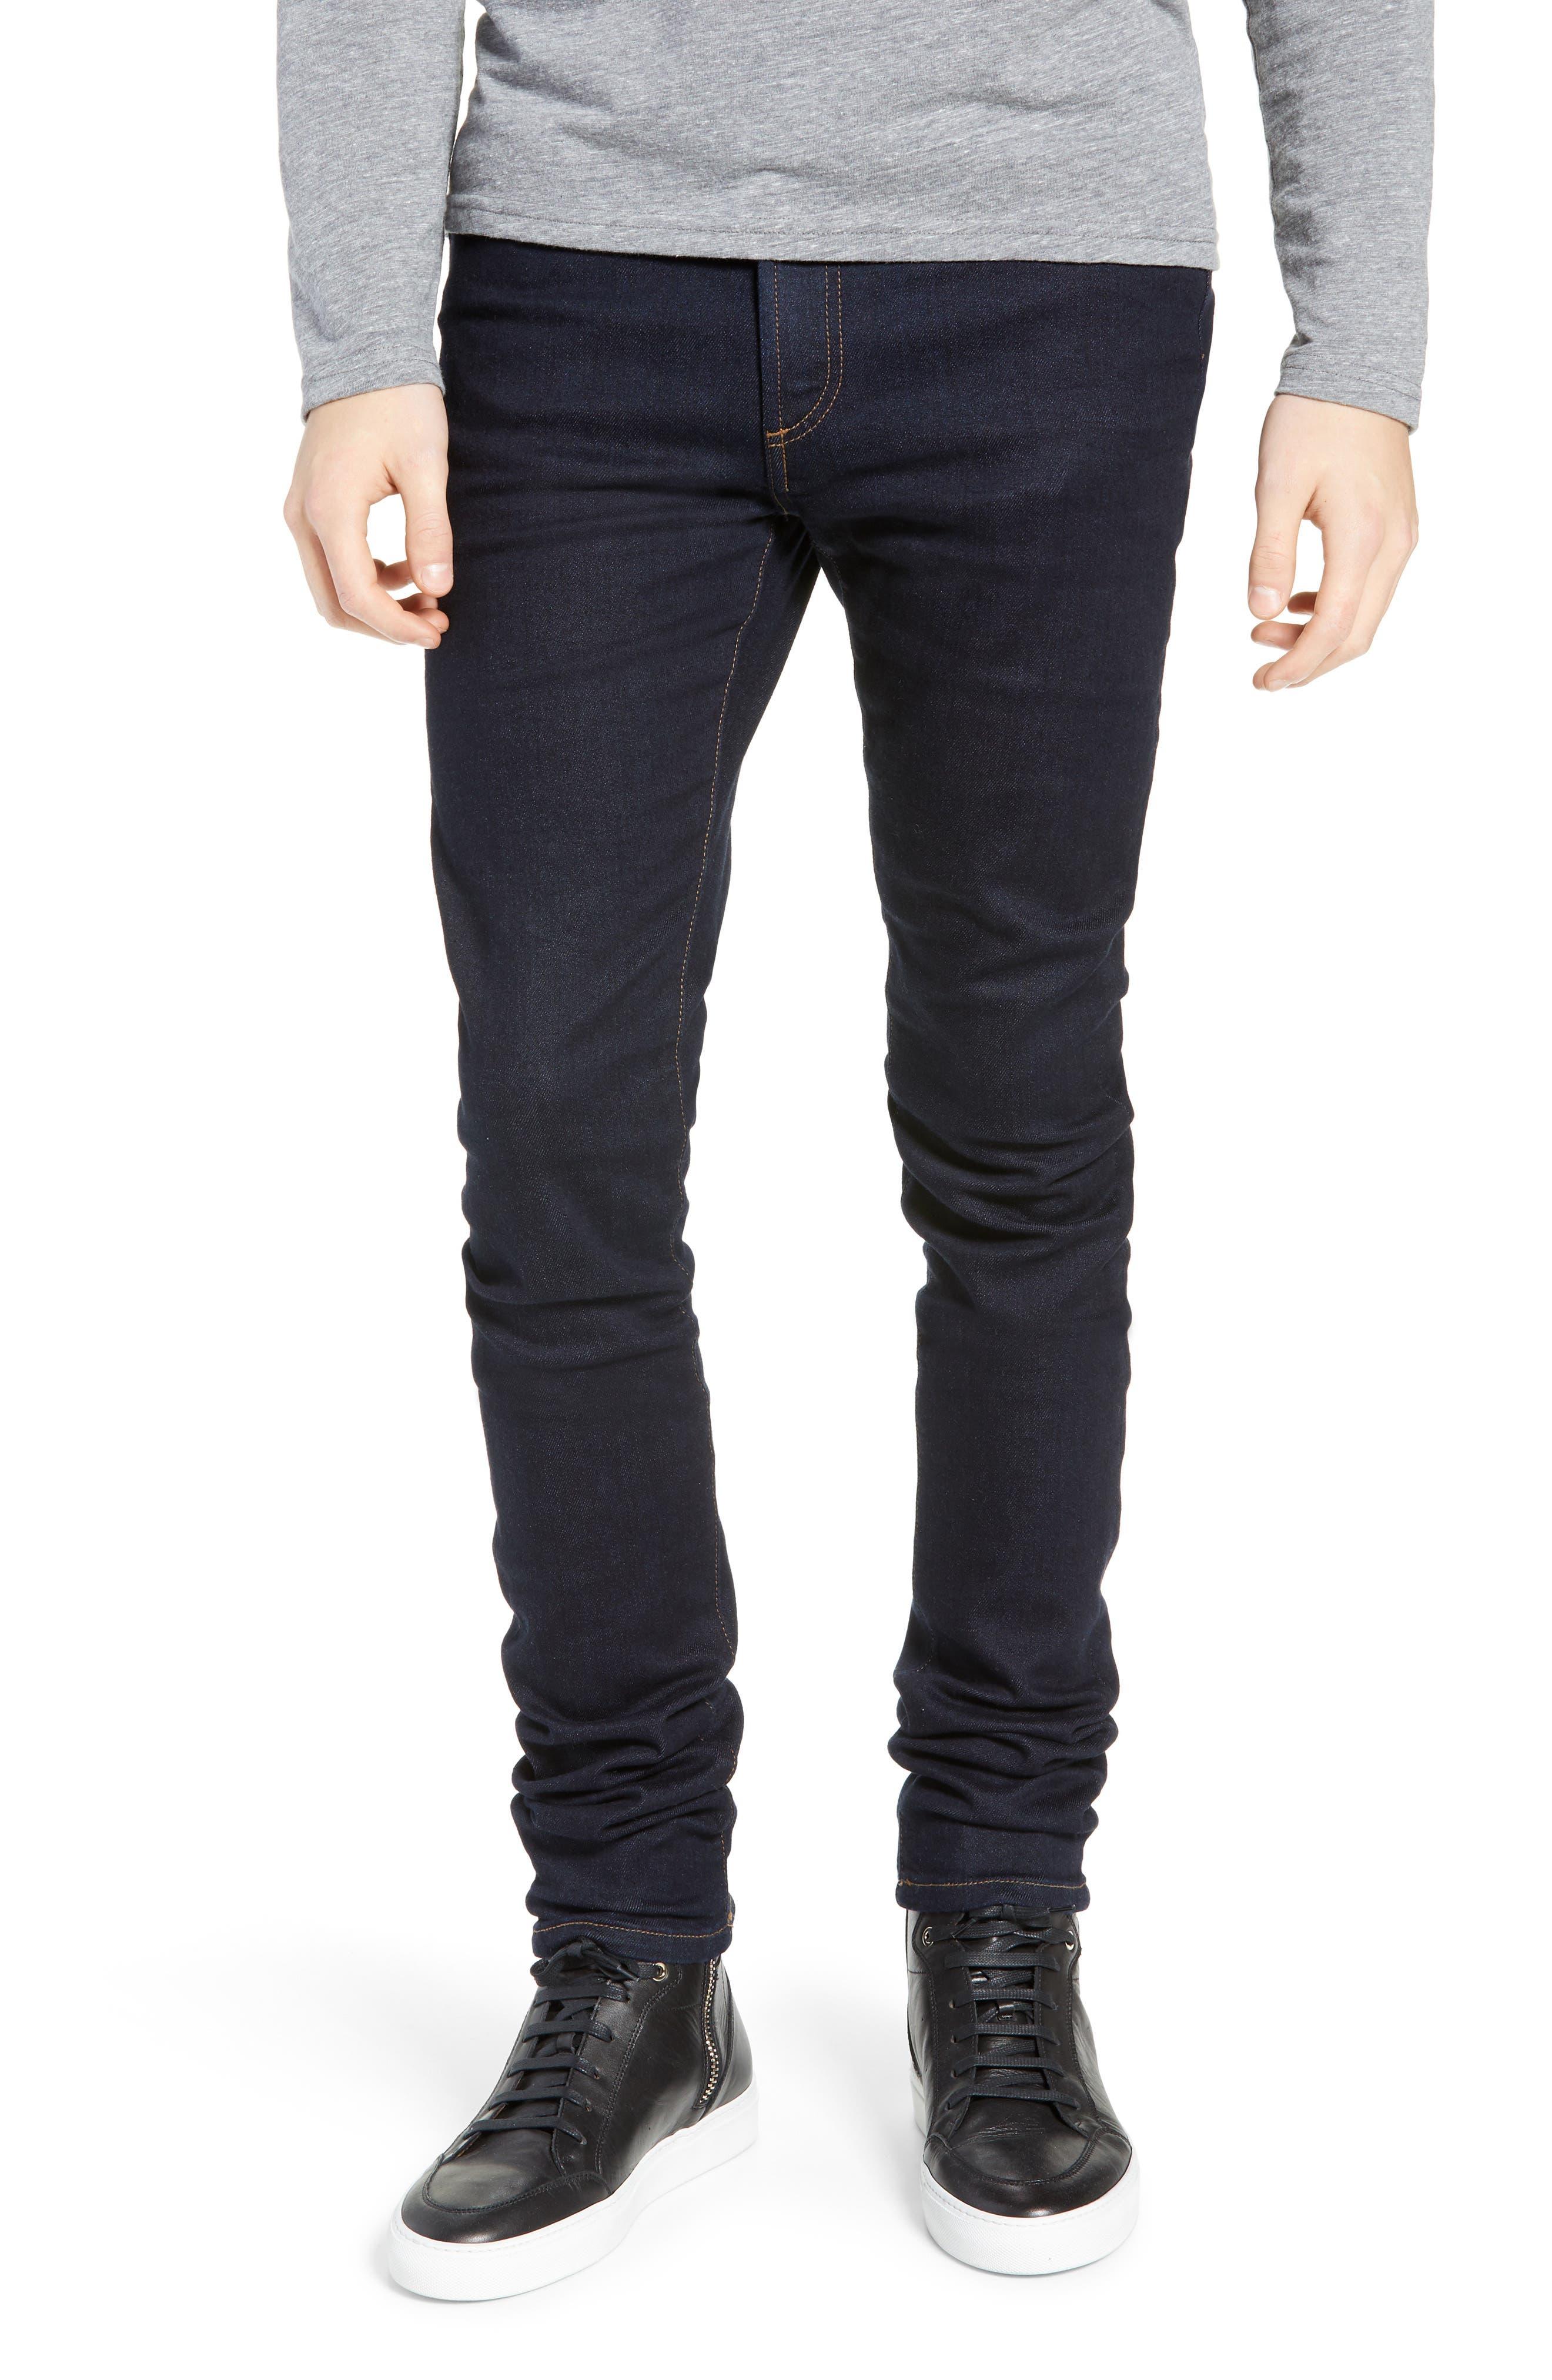 MONFRERE Greyson Skinny Fit Jeans in Indigo